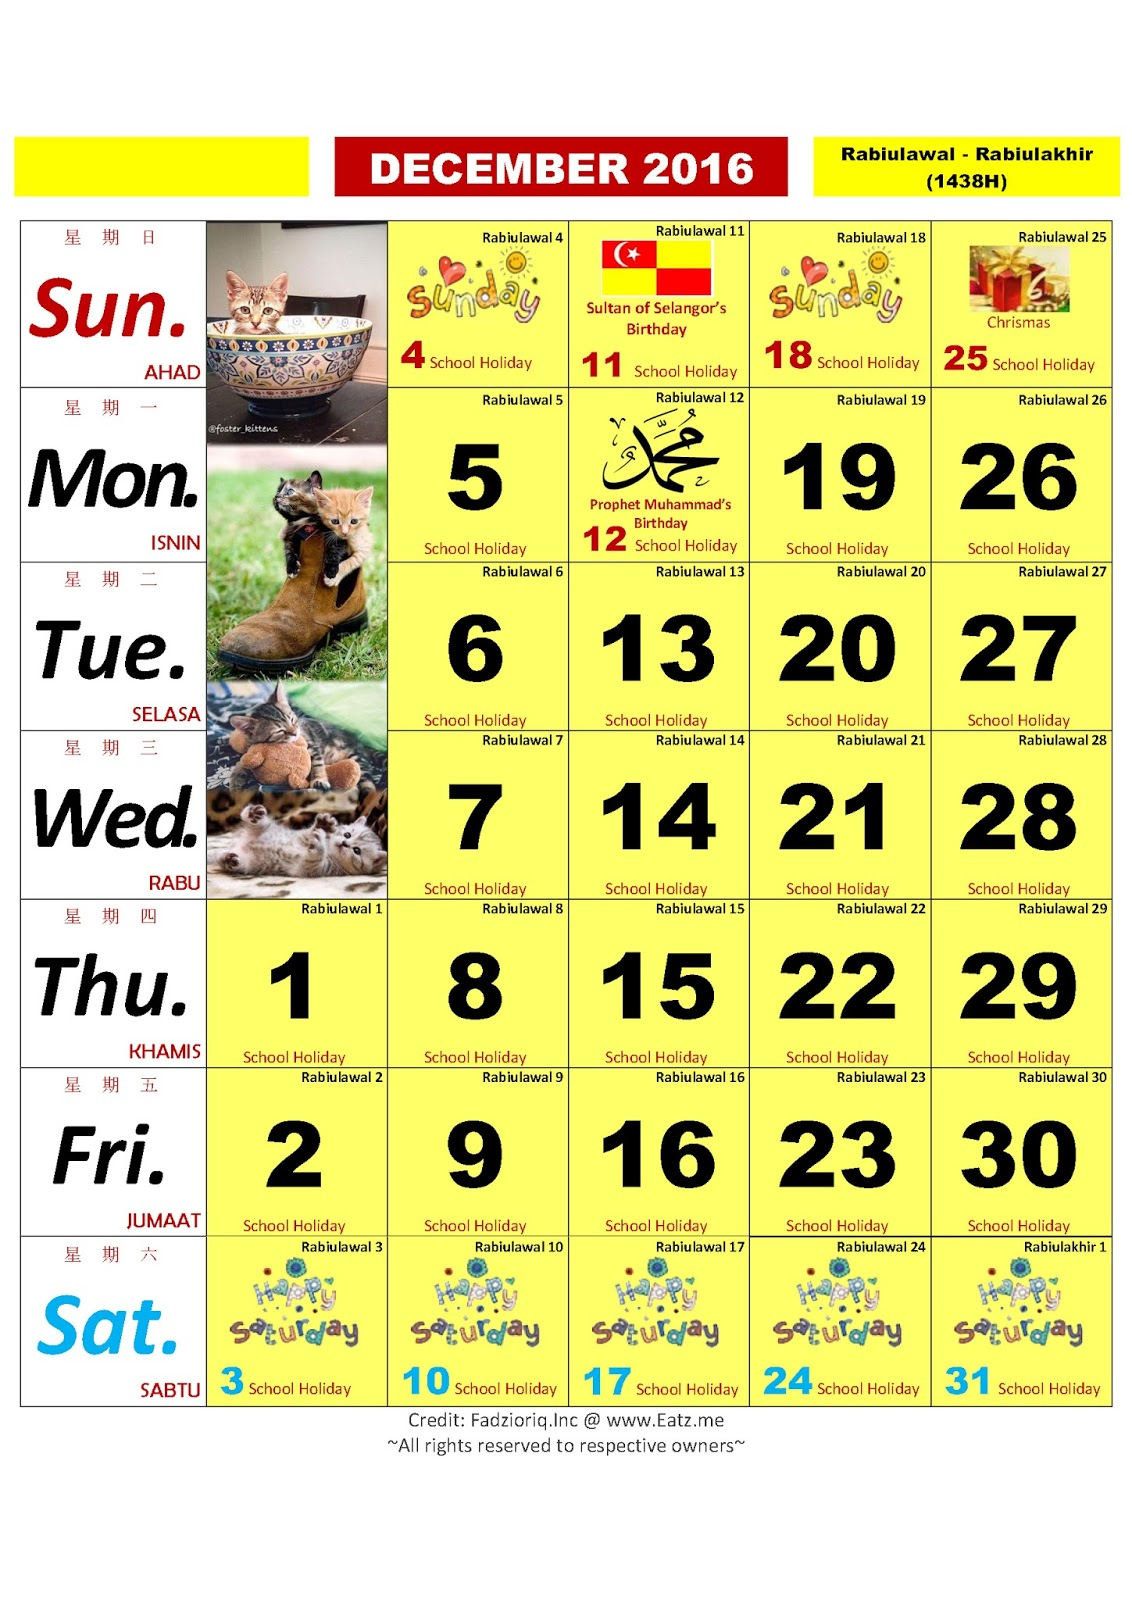 Calendar Kuda May : Koleksi filem melayu antarabangsa info kalender kuda